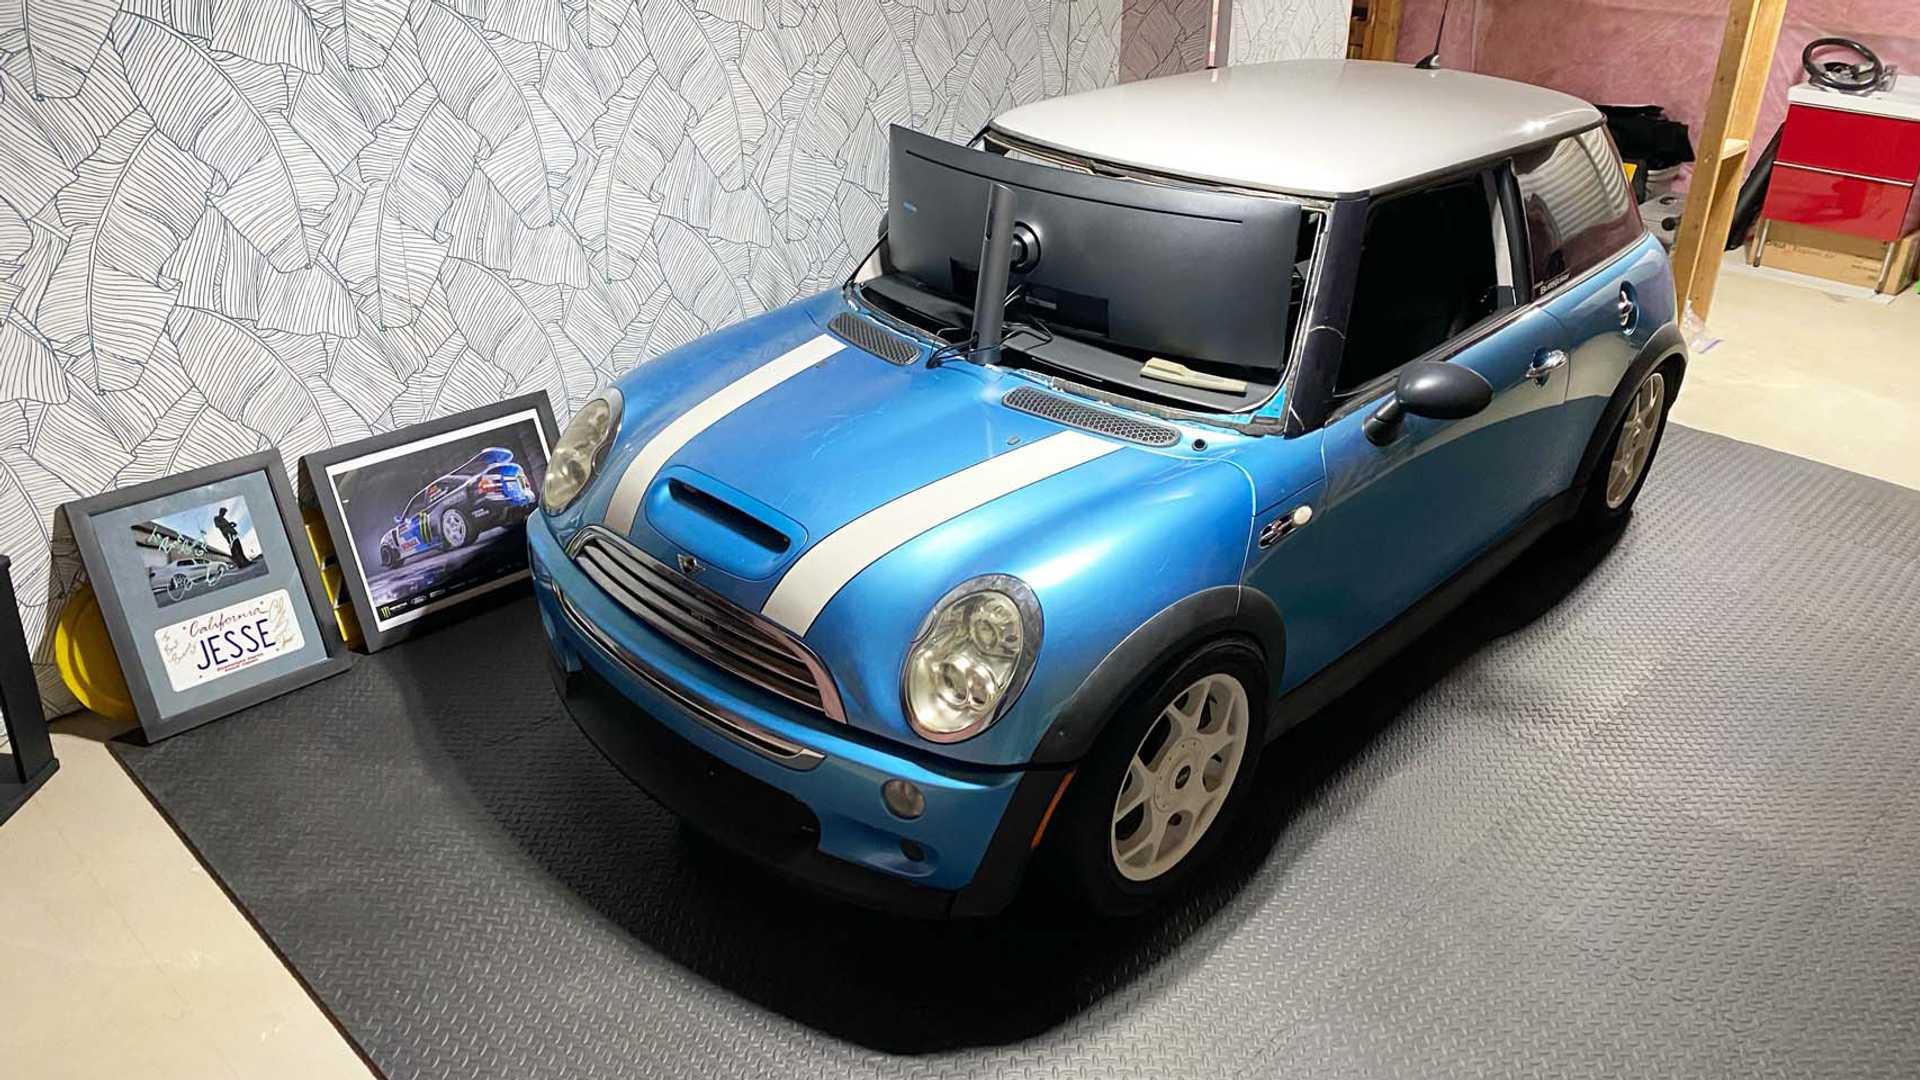 Mini_Cooper_S_Sim_Racing_Rig_0013